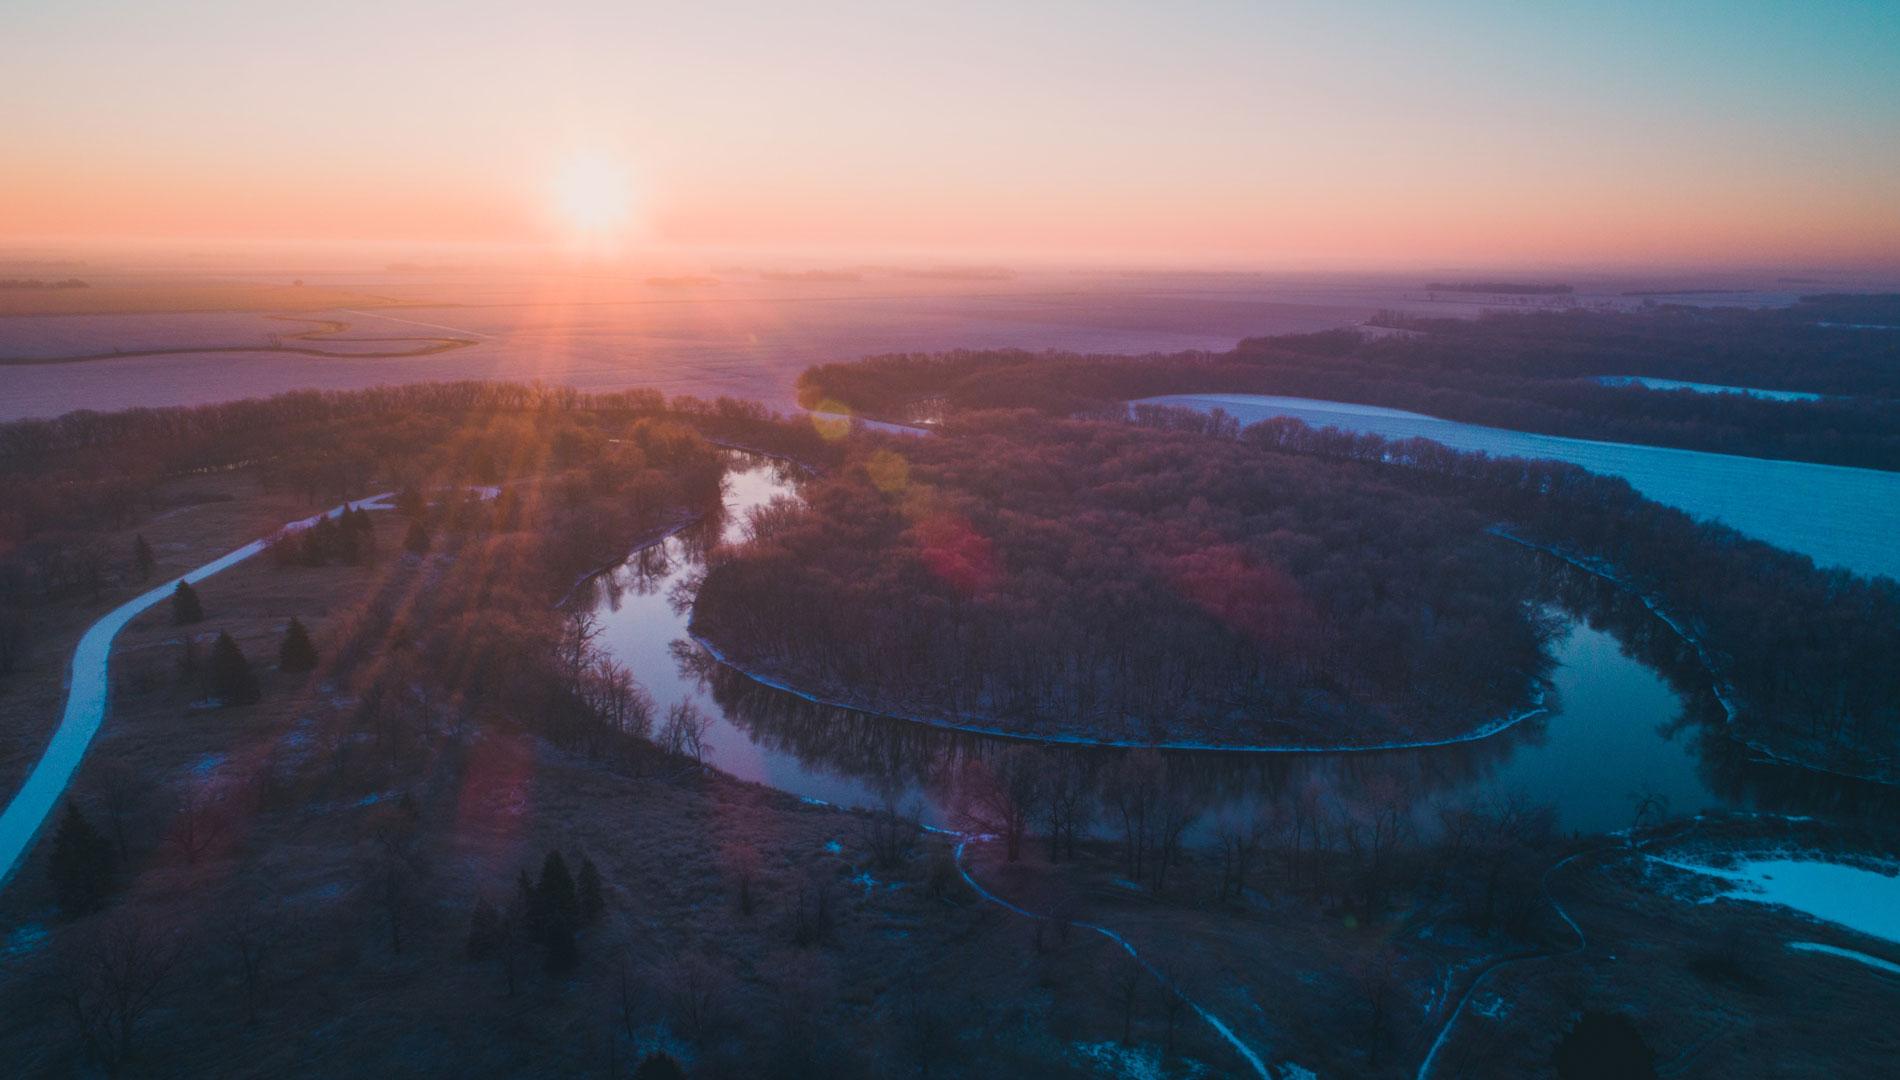 Sunrise over river in North Dakota